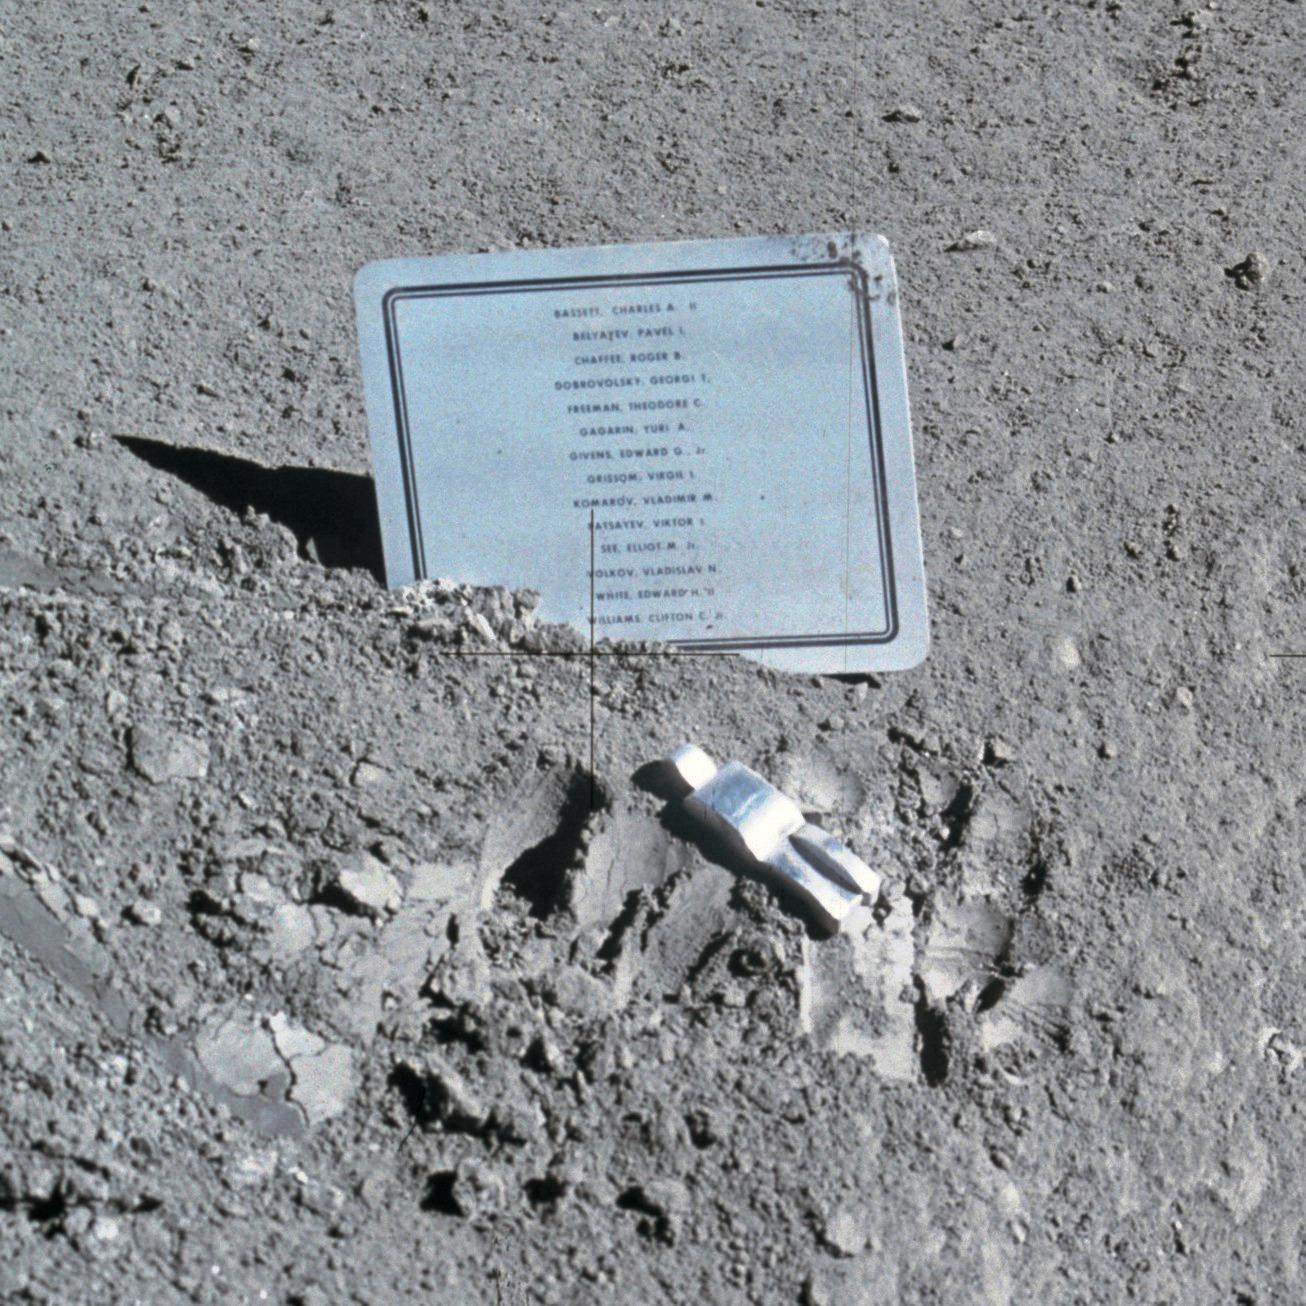 commemorative plaque on the Moon